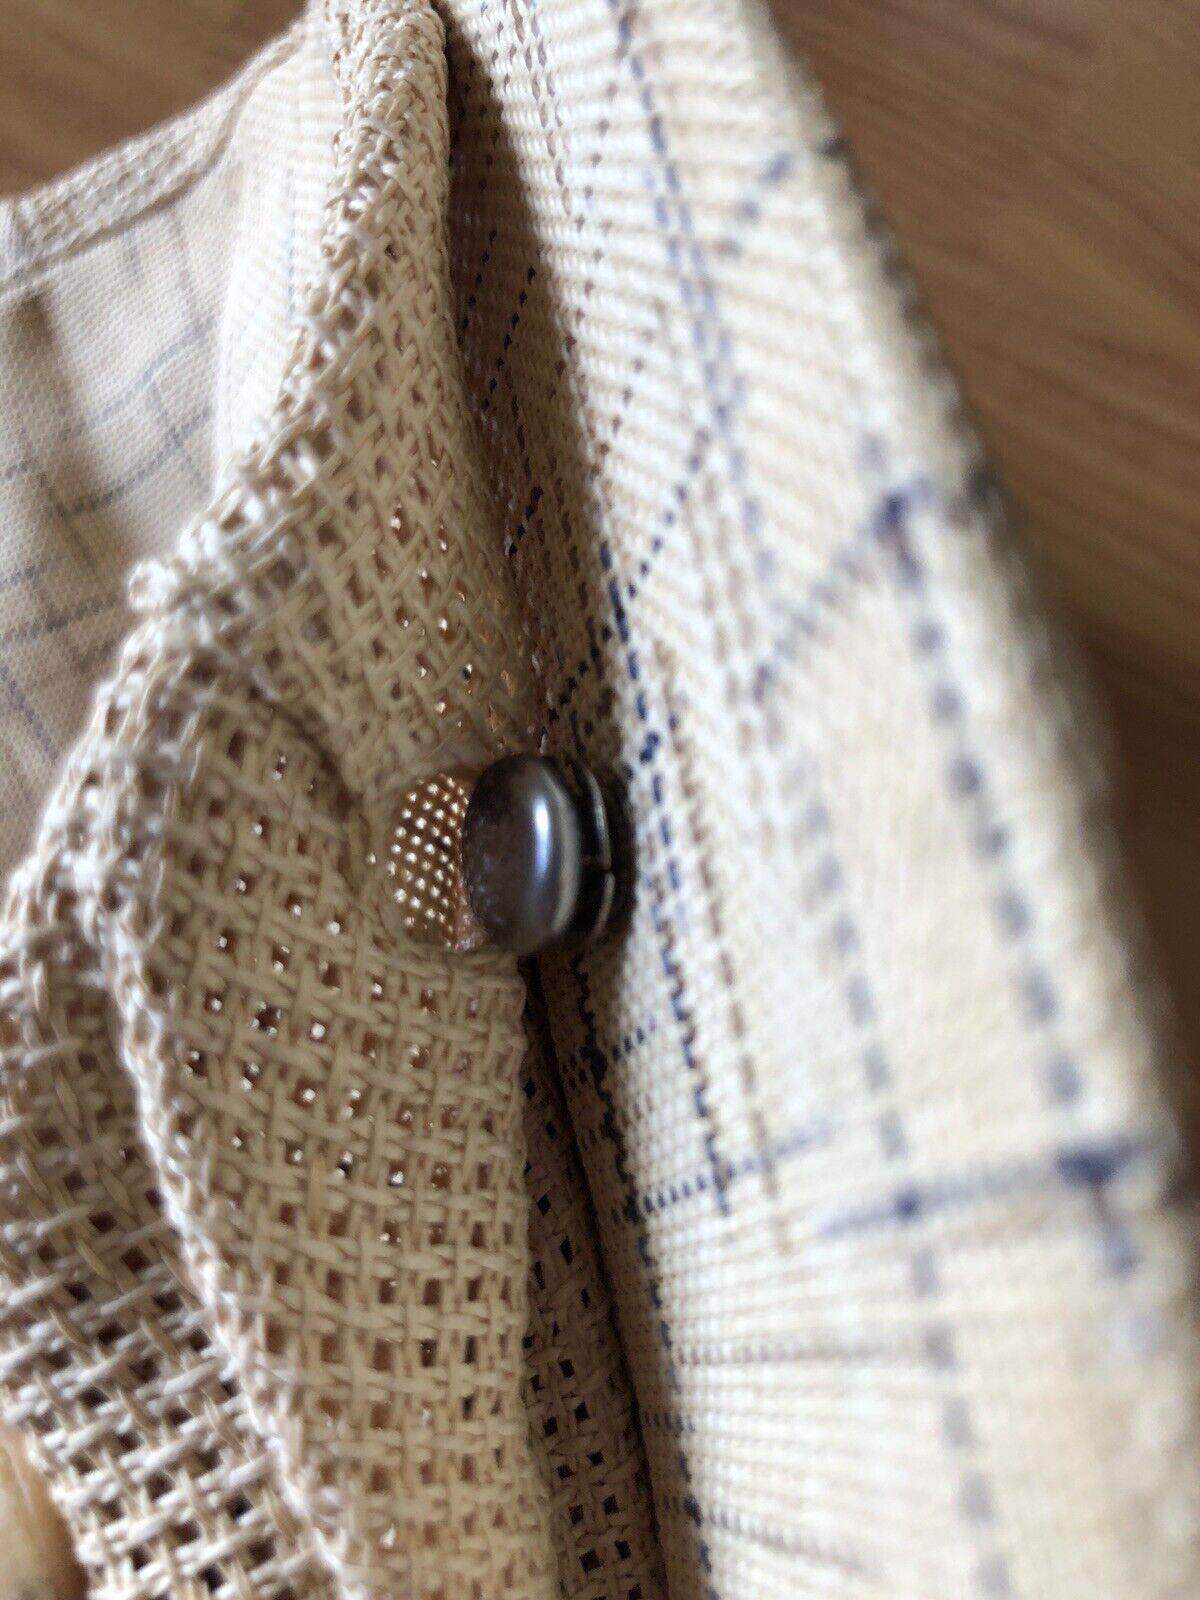 1950's Men's Japan Straw Newsboy Cap Size 7 1/4 - image 8